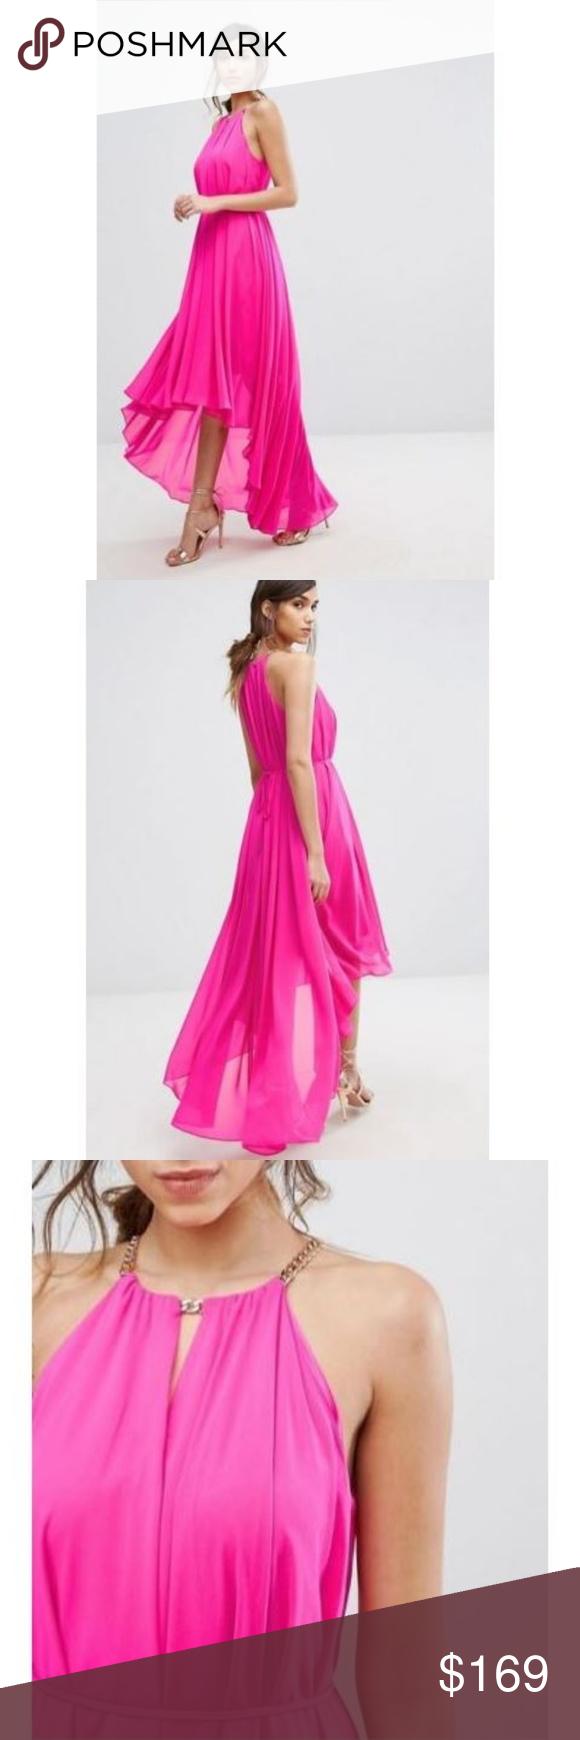 40cbf1b33f78d Ted Baker Dress size 3 US 8 Harpah High Low Dress Ted Baker Dress size 3